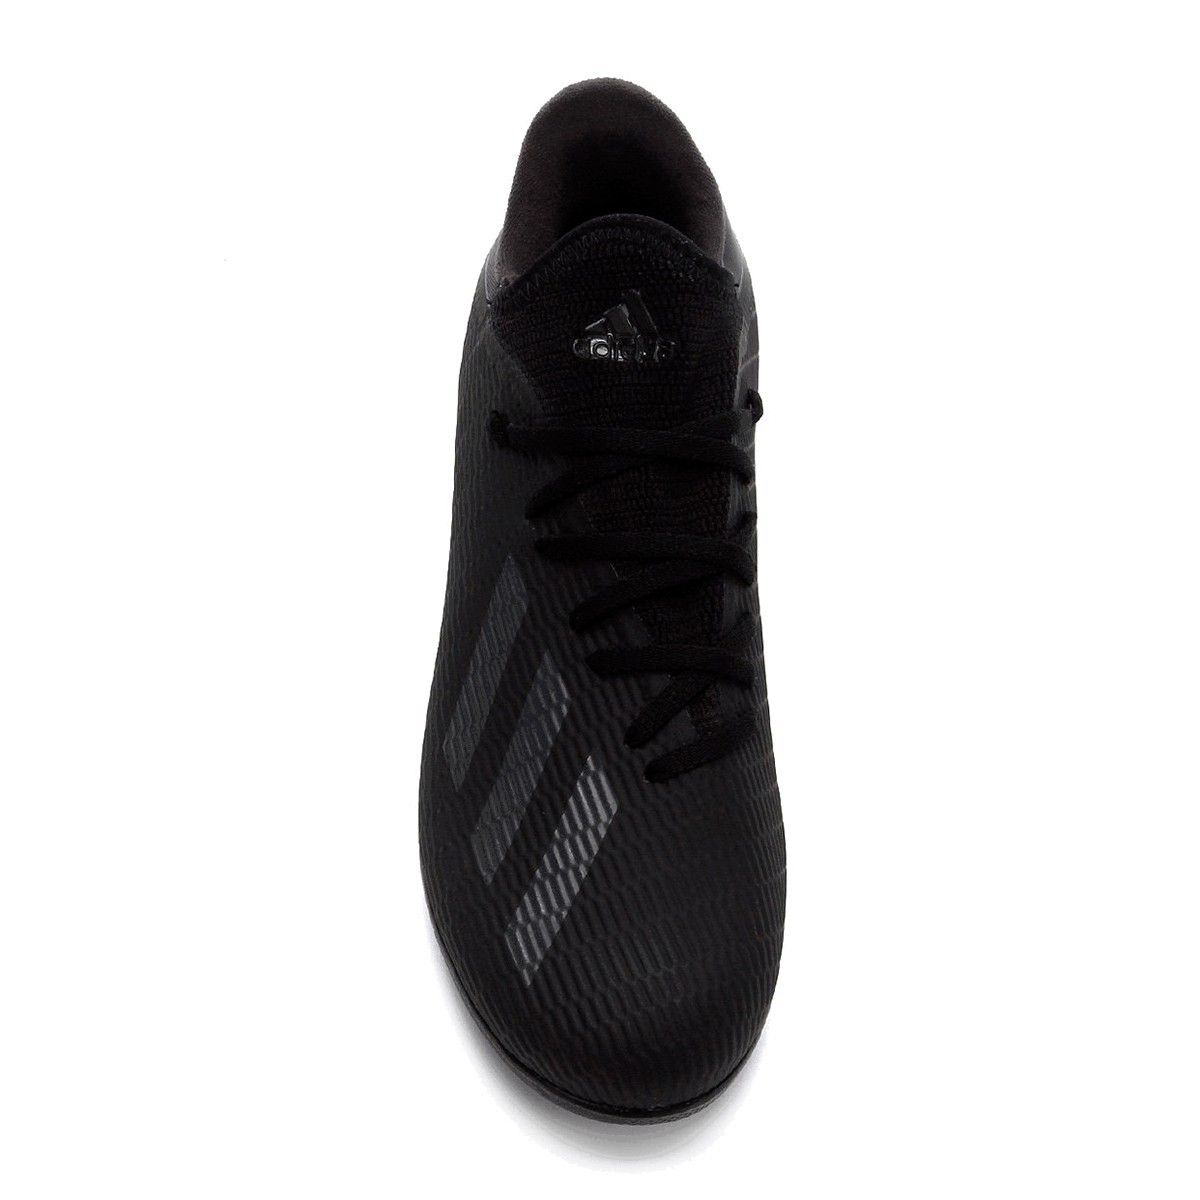 Chuteira Adidas Society x 19 3 Tf Preto